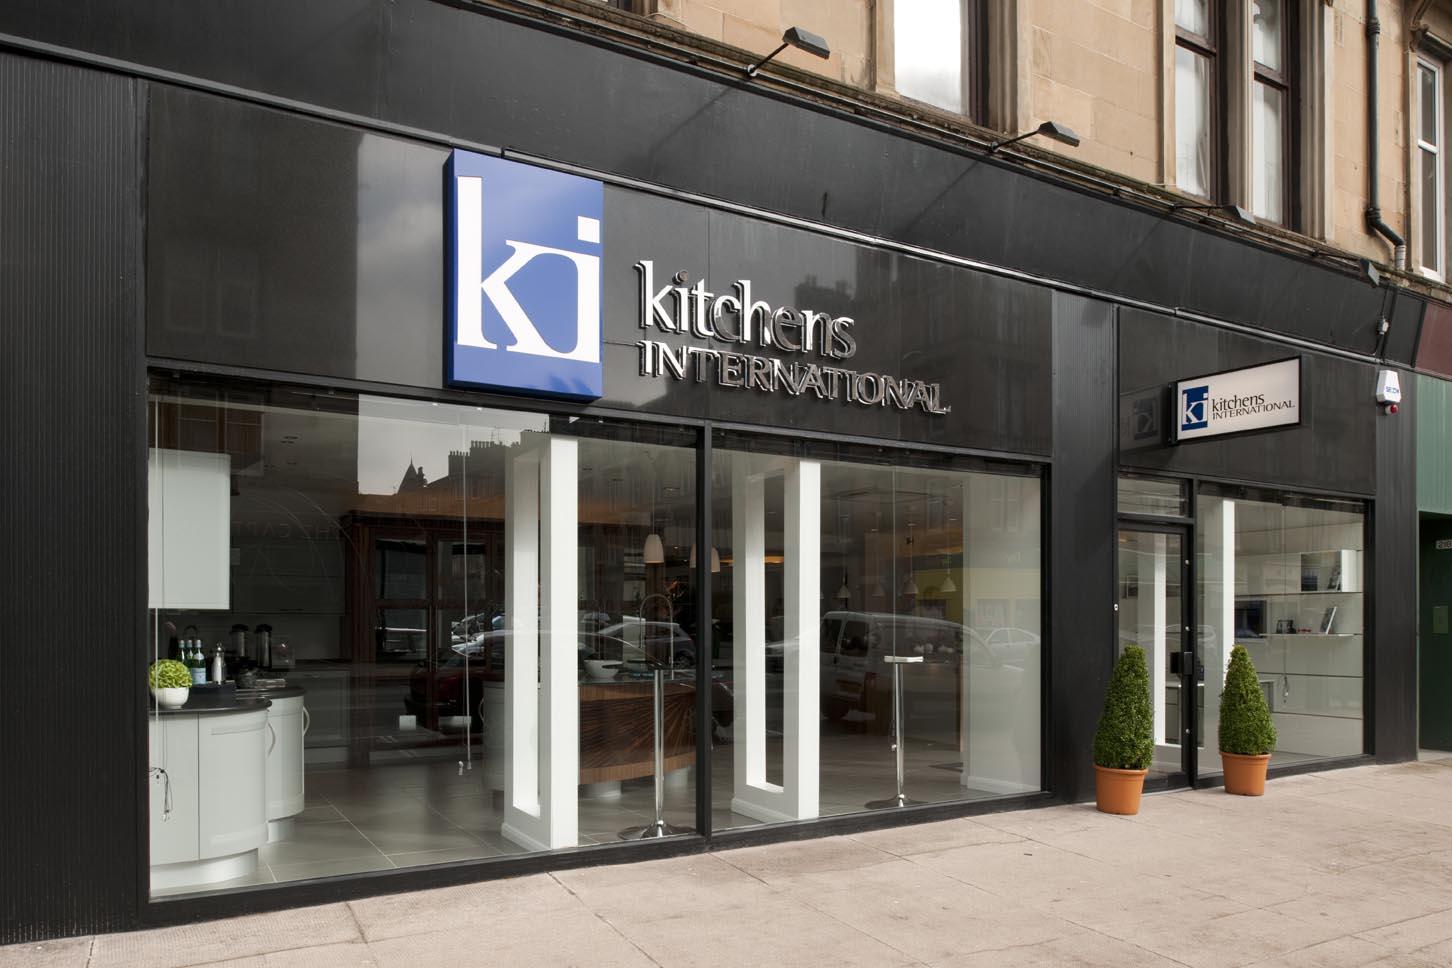 KITCHENS INTERNATIONAL - GLASGOW STUDIO